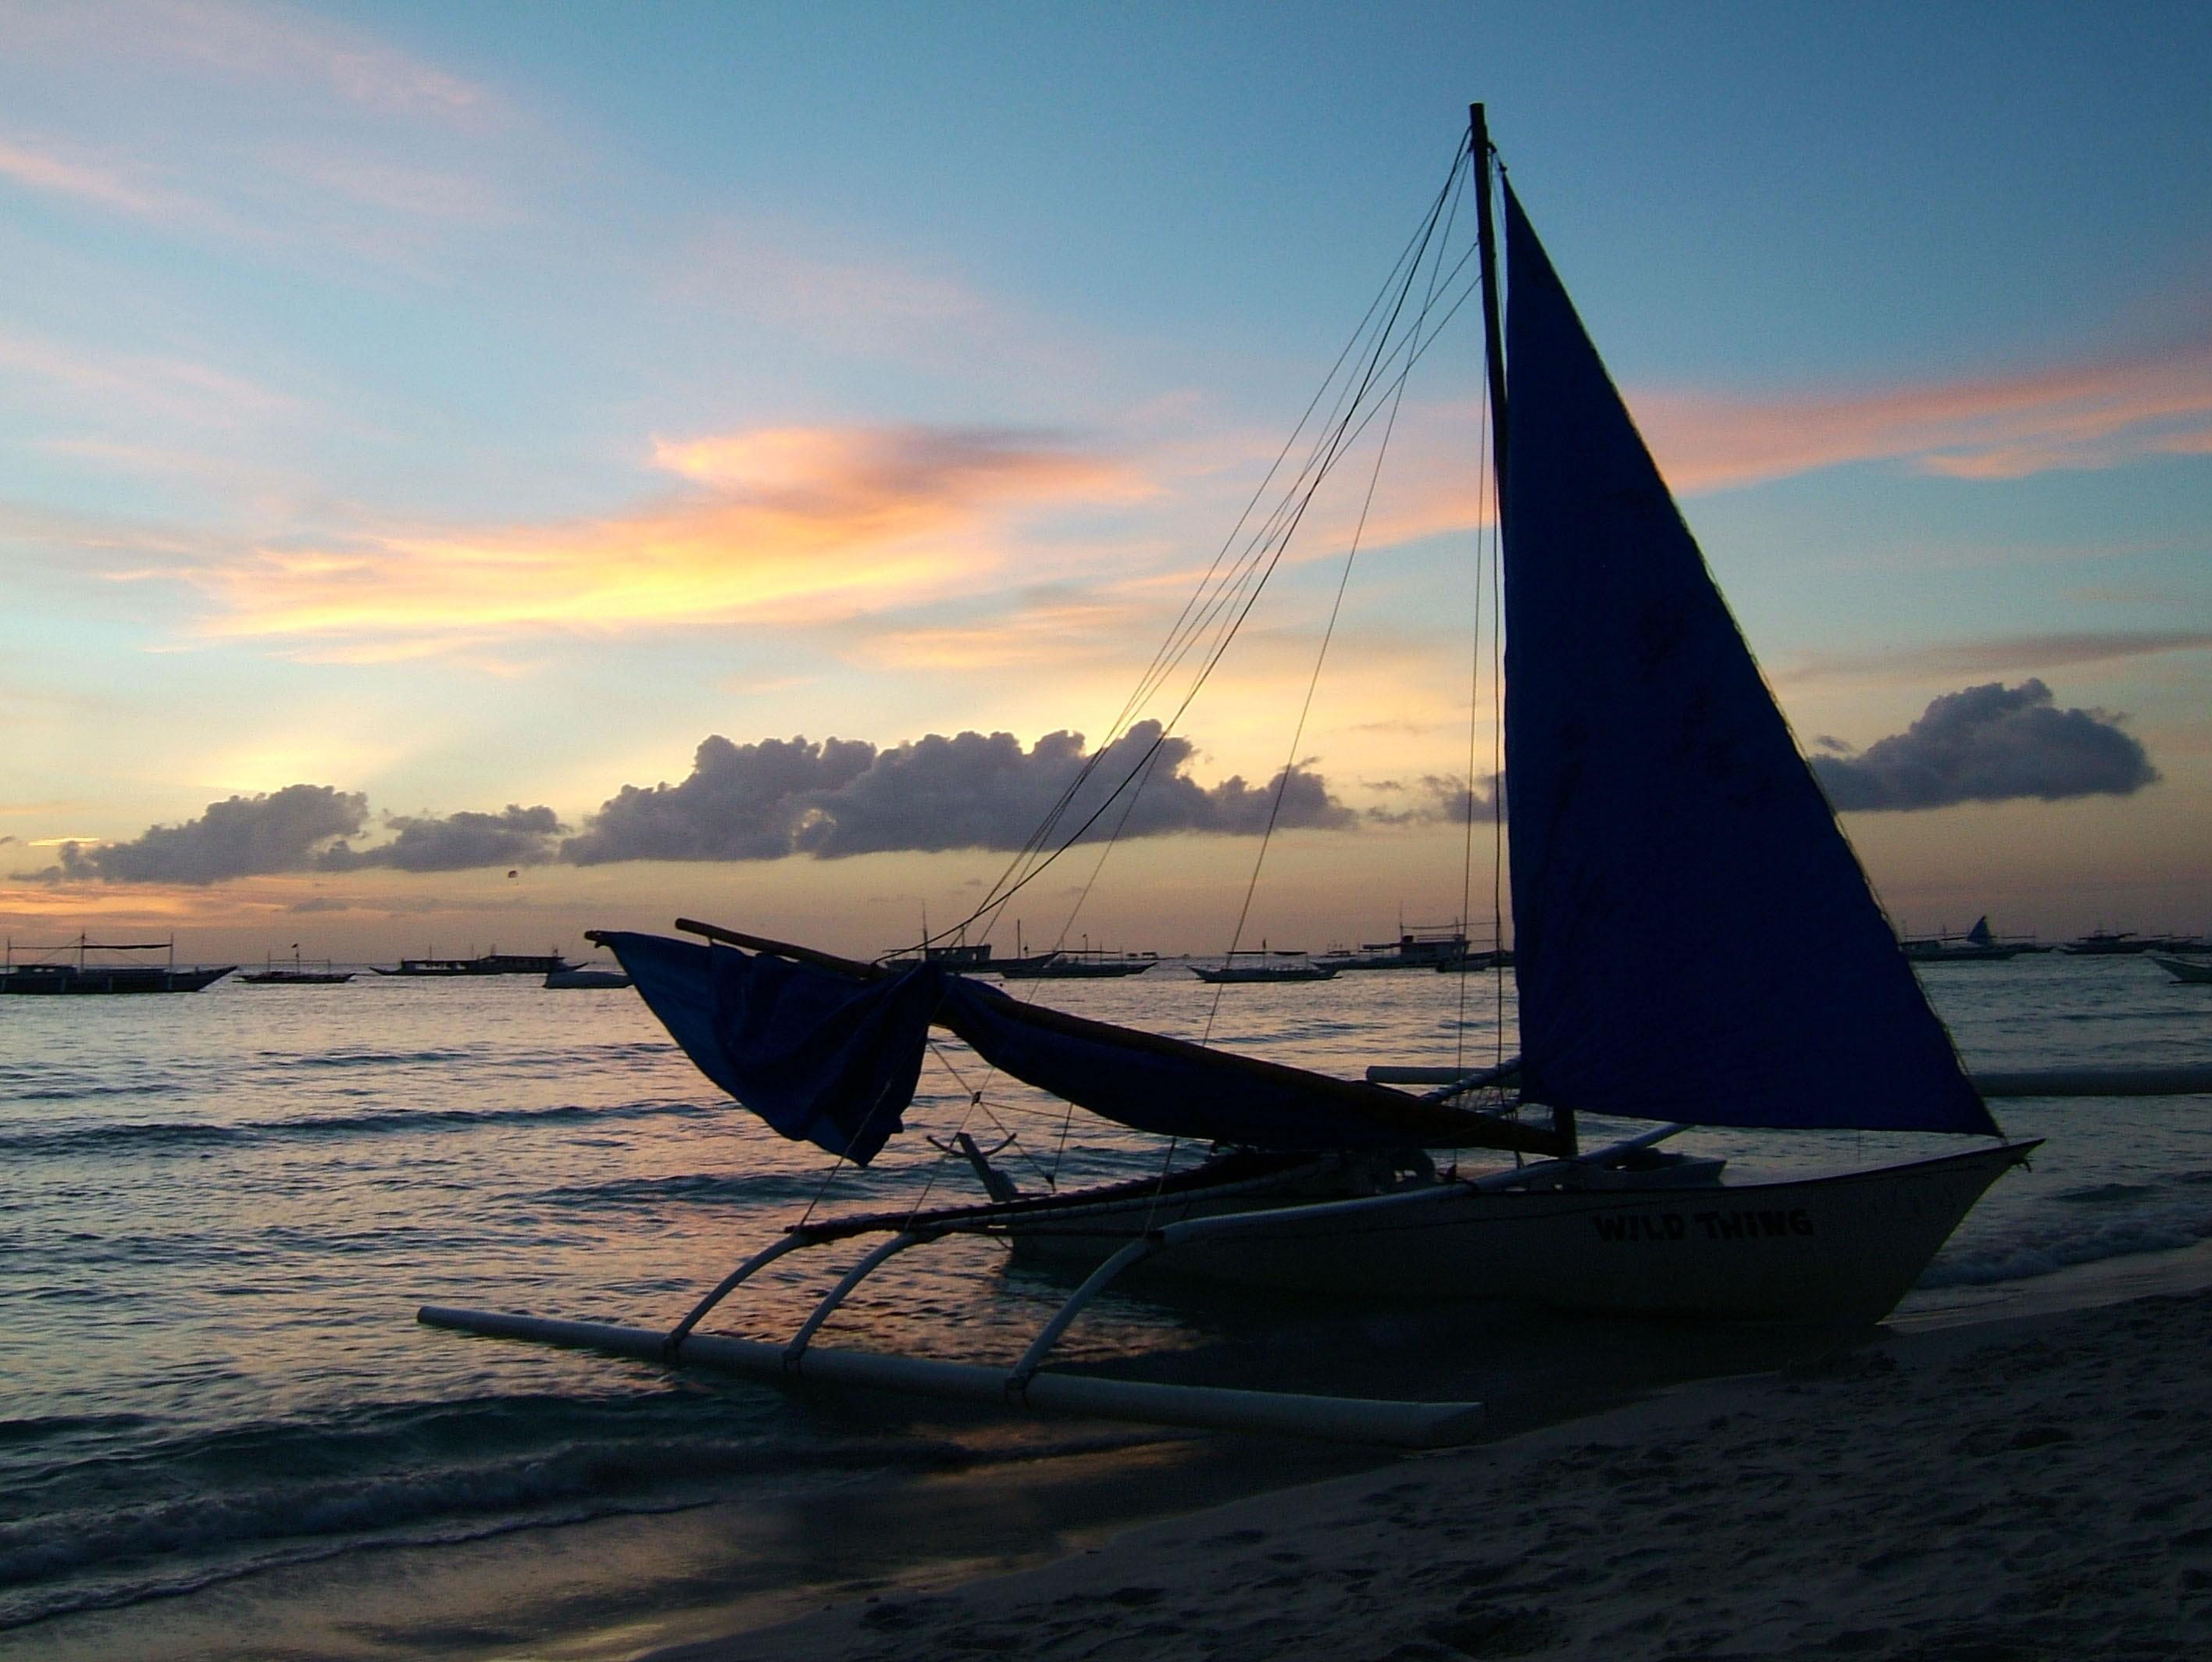 Philippines Panay Negros Caticlan Boracay White Beach Sunset Dec 2003 04